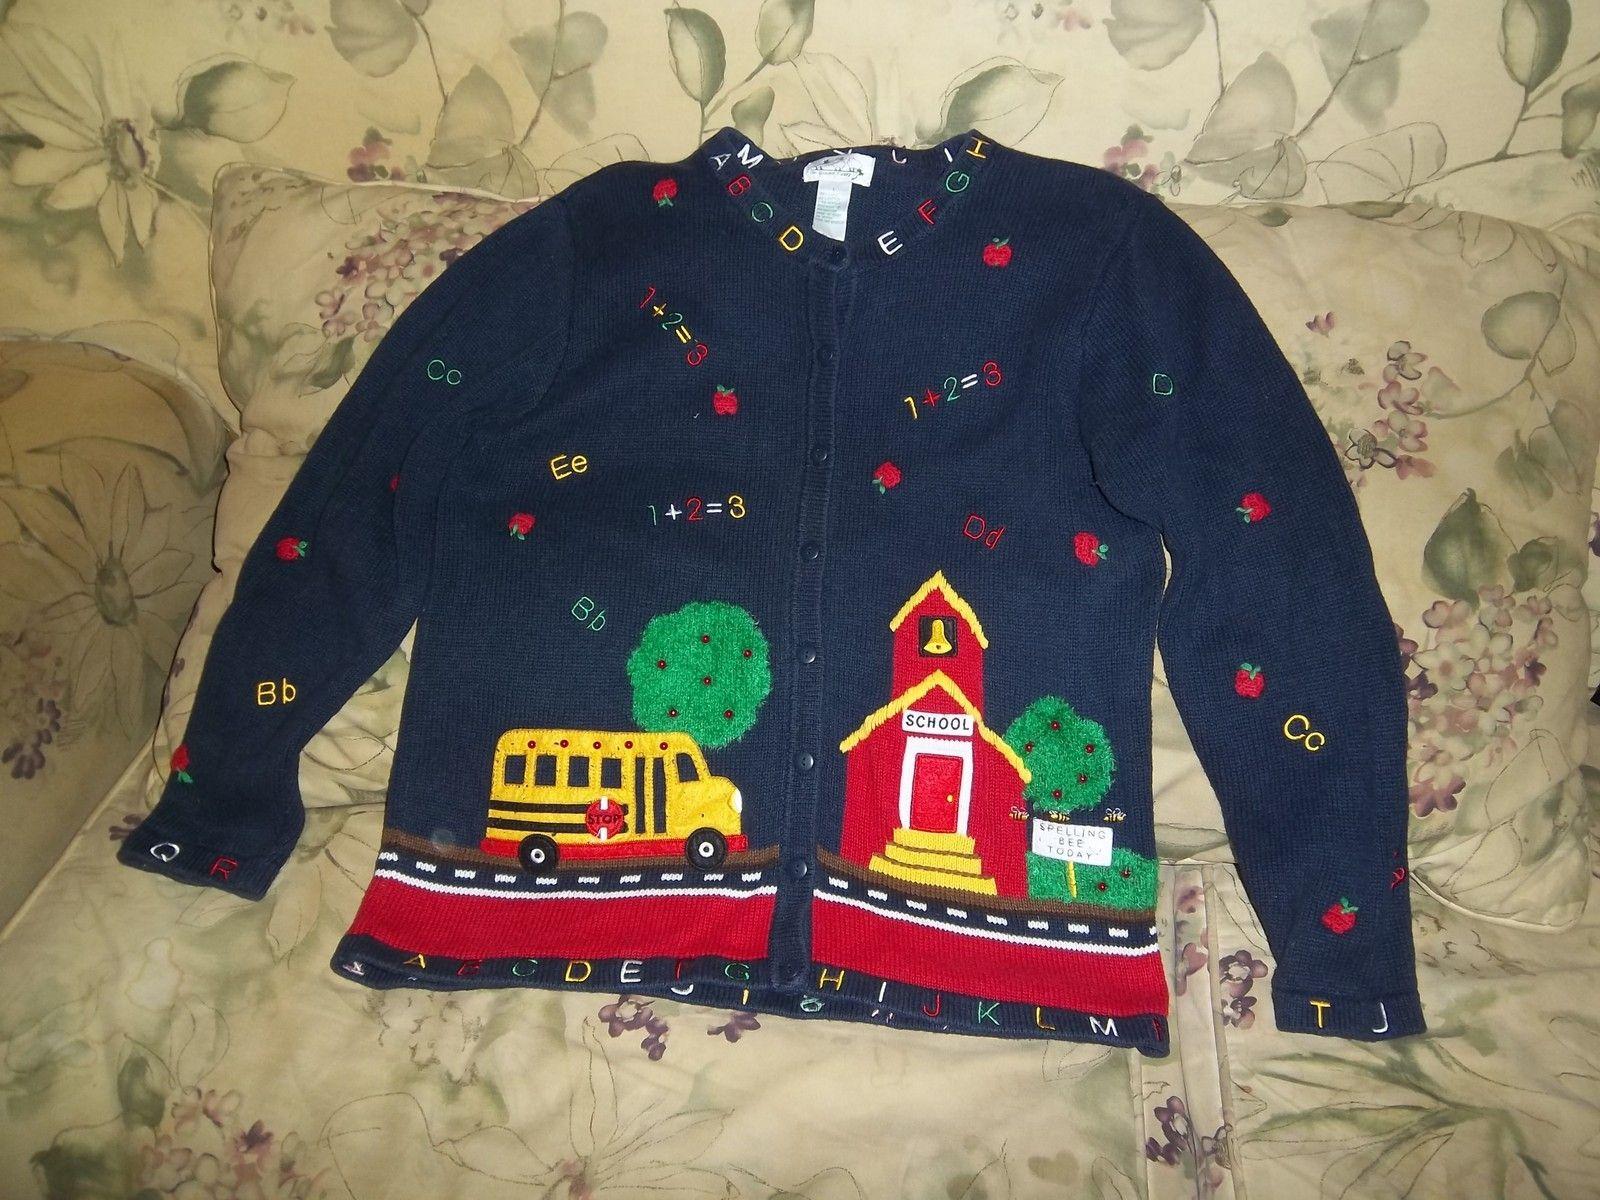 quacker factory size L school teacher scene sweater | eBay | Teacher